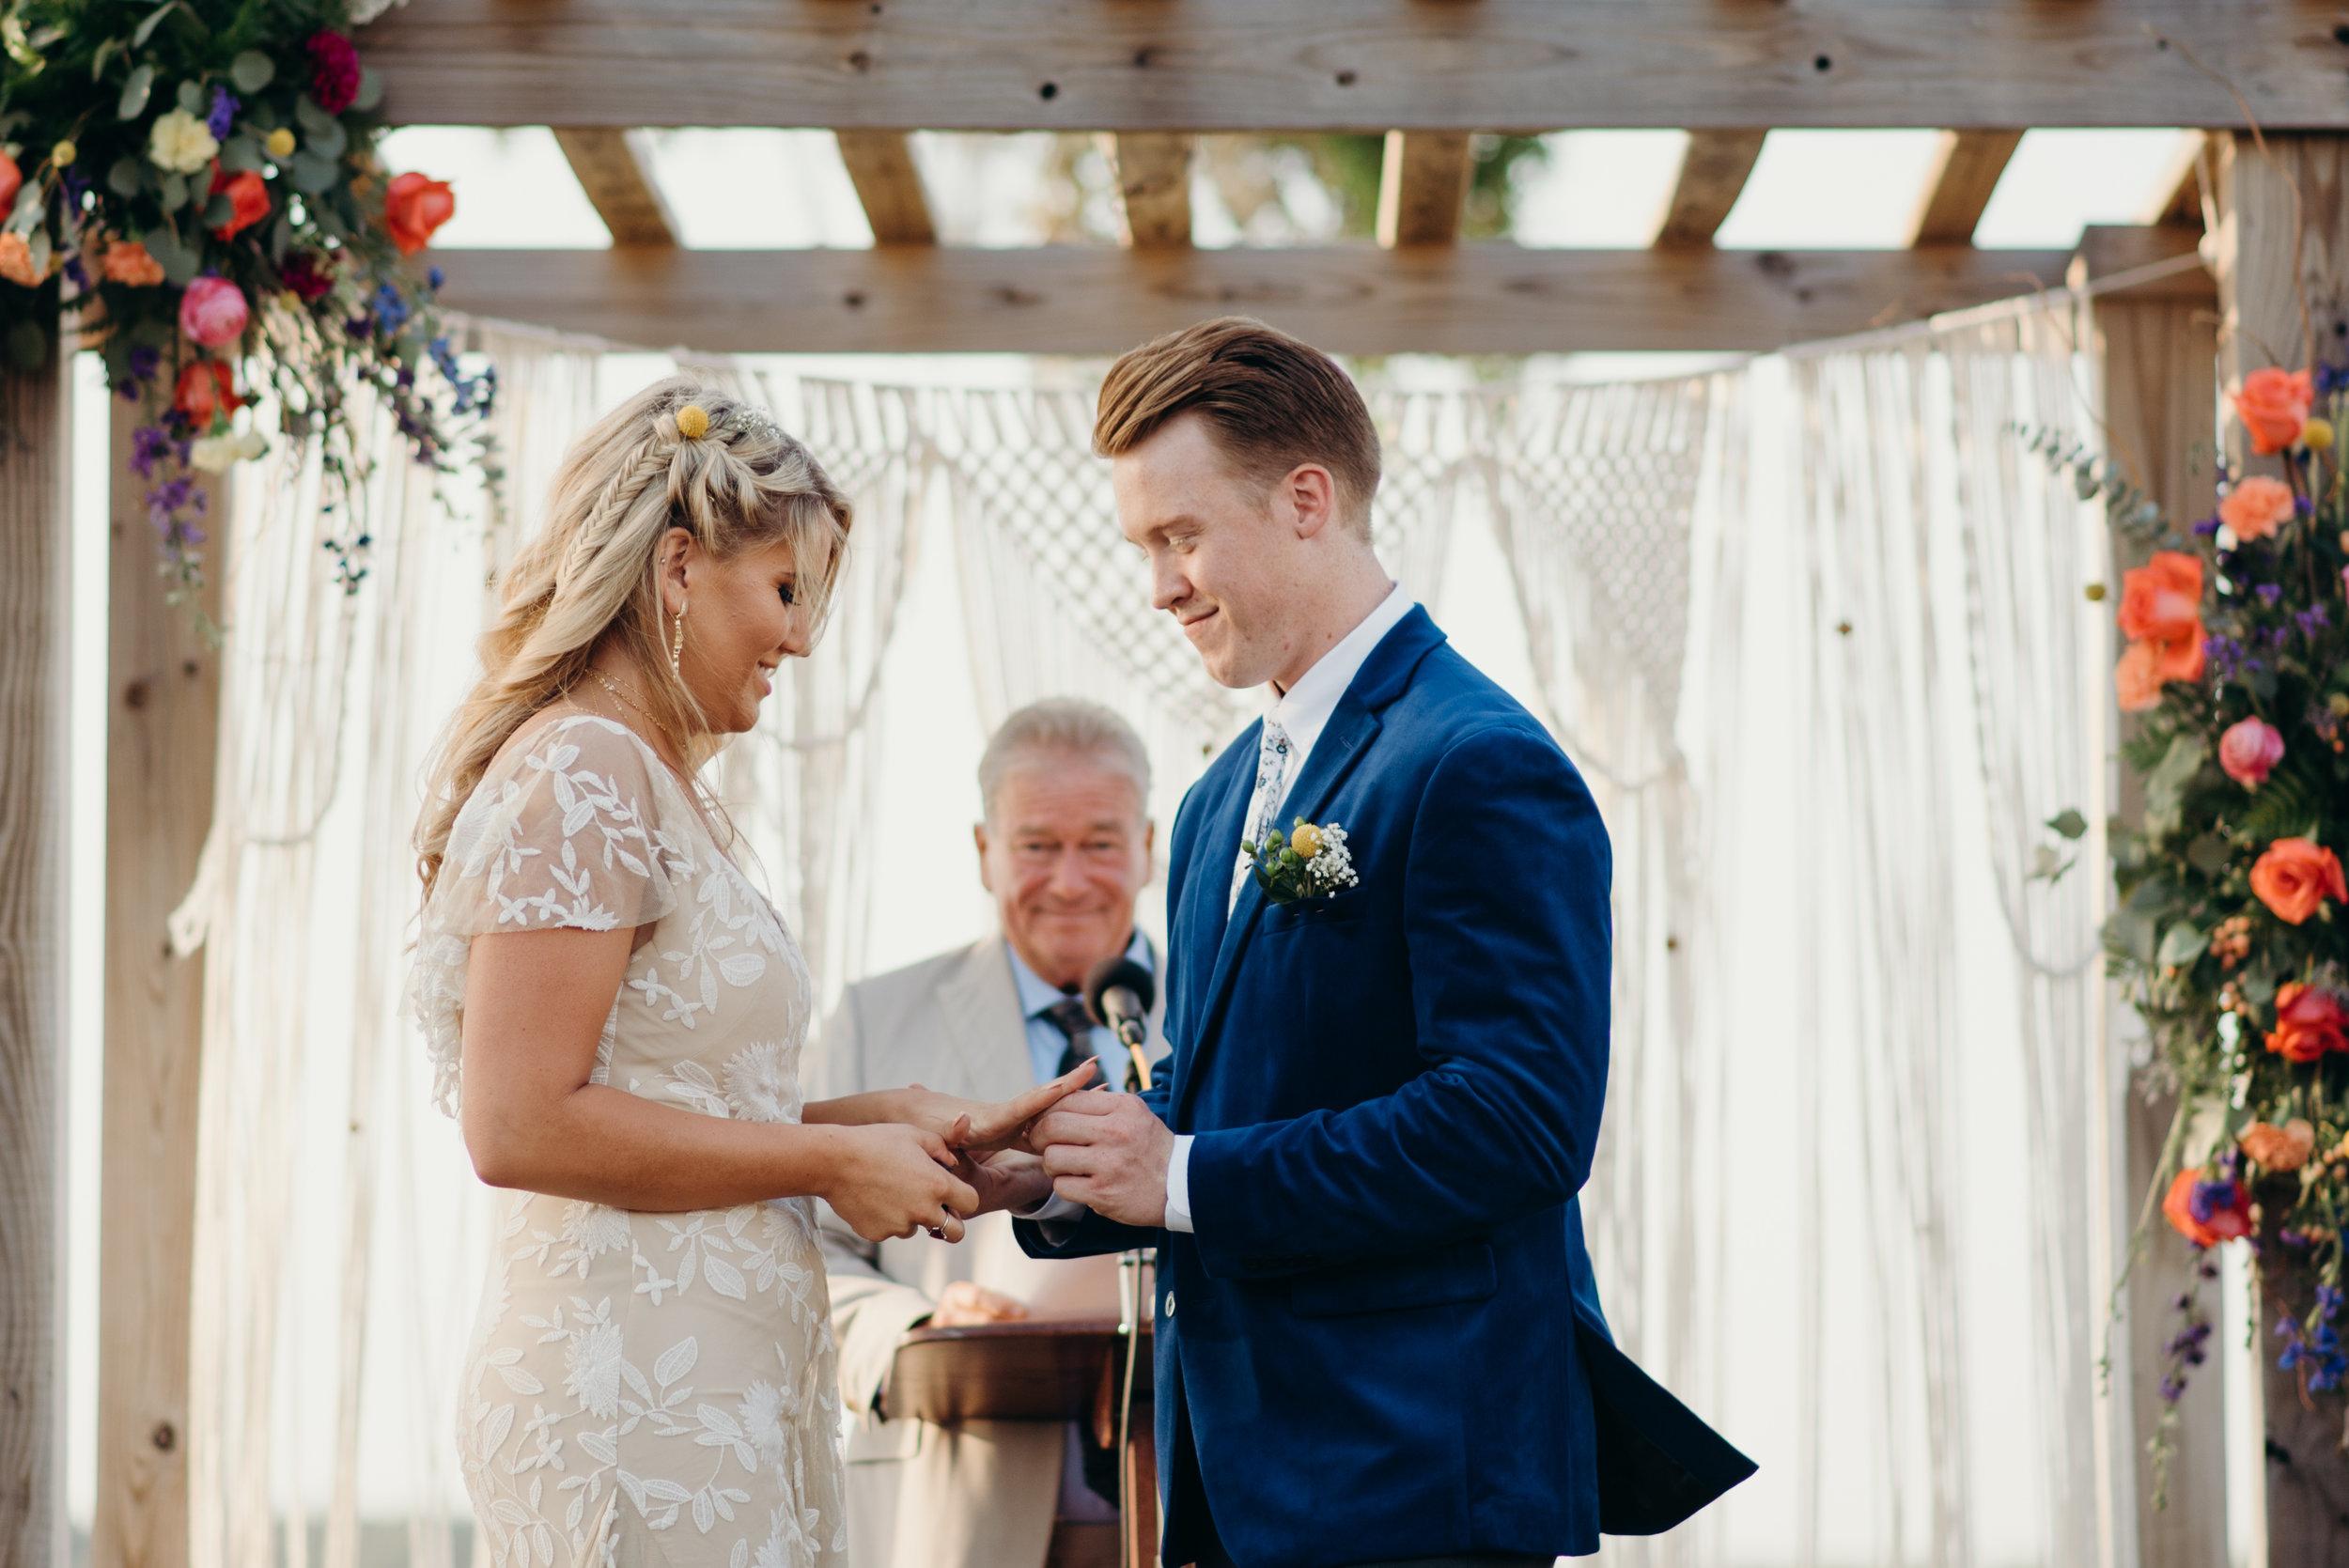 zayda-collin-panama-city-wedding-photography-trippy-bohemian-lisa-frank-wedding-ceremony-71.jpg